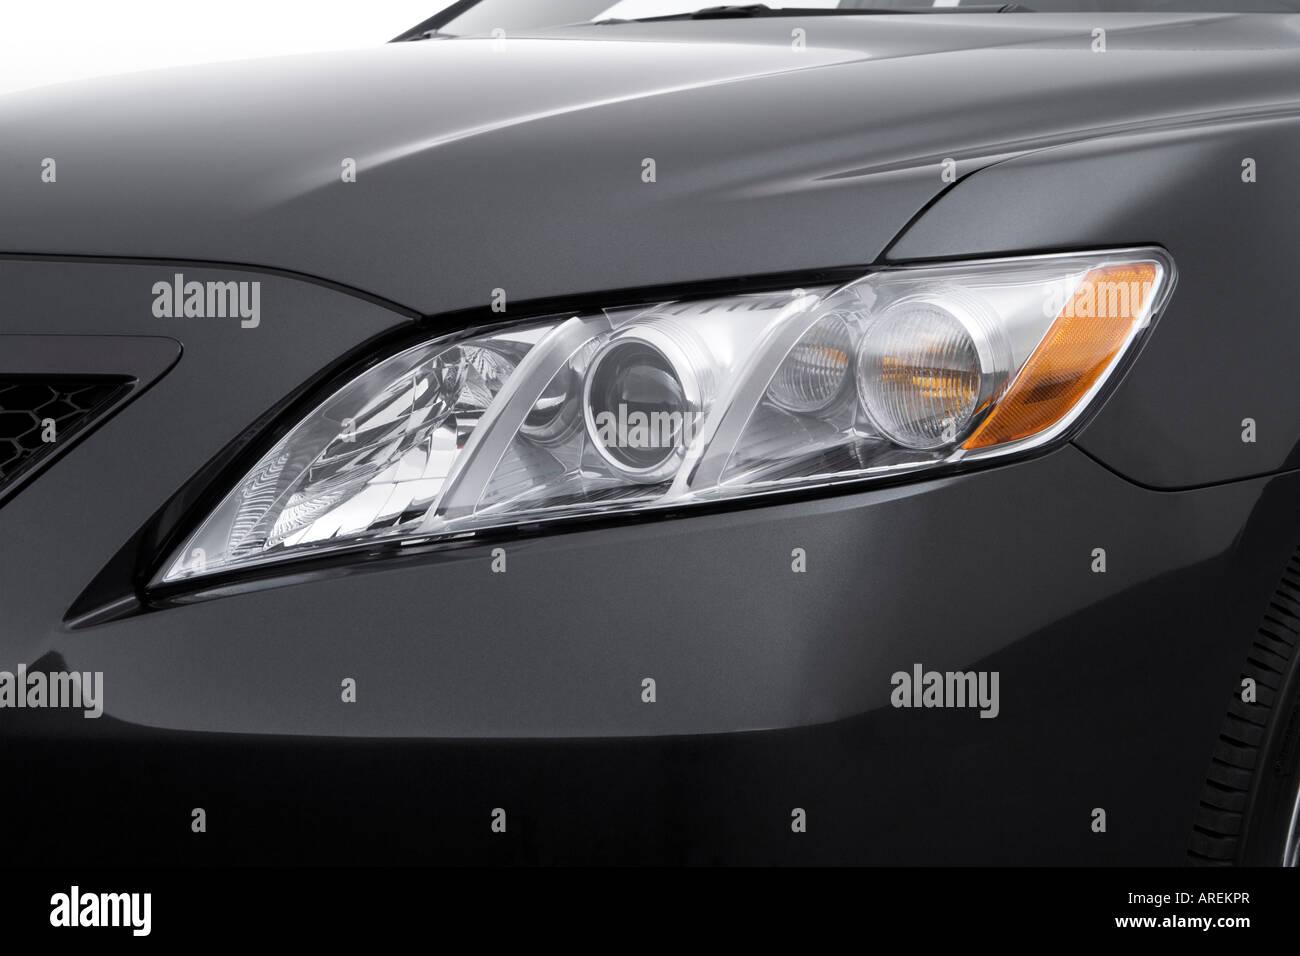 2007 toyota camry se v6 in gray headlight